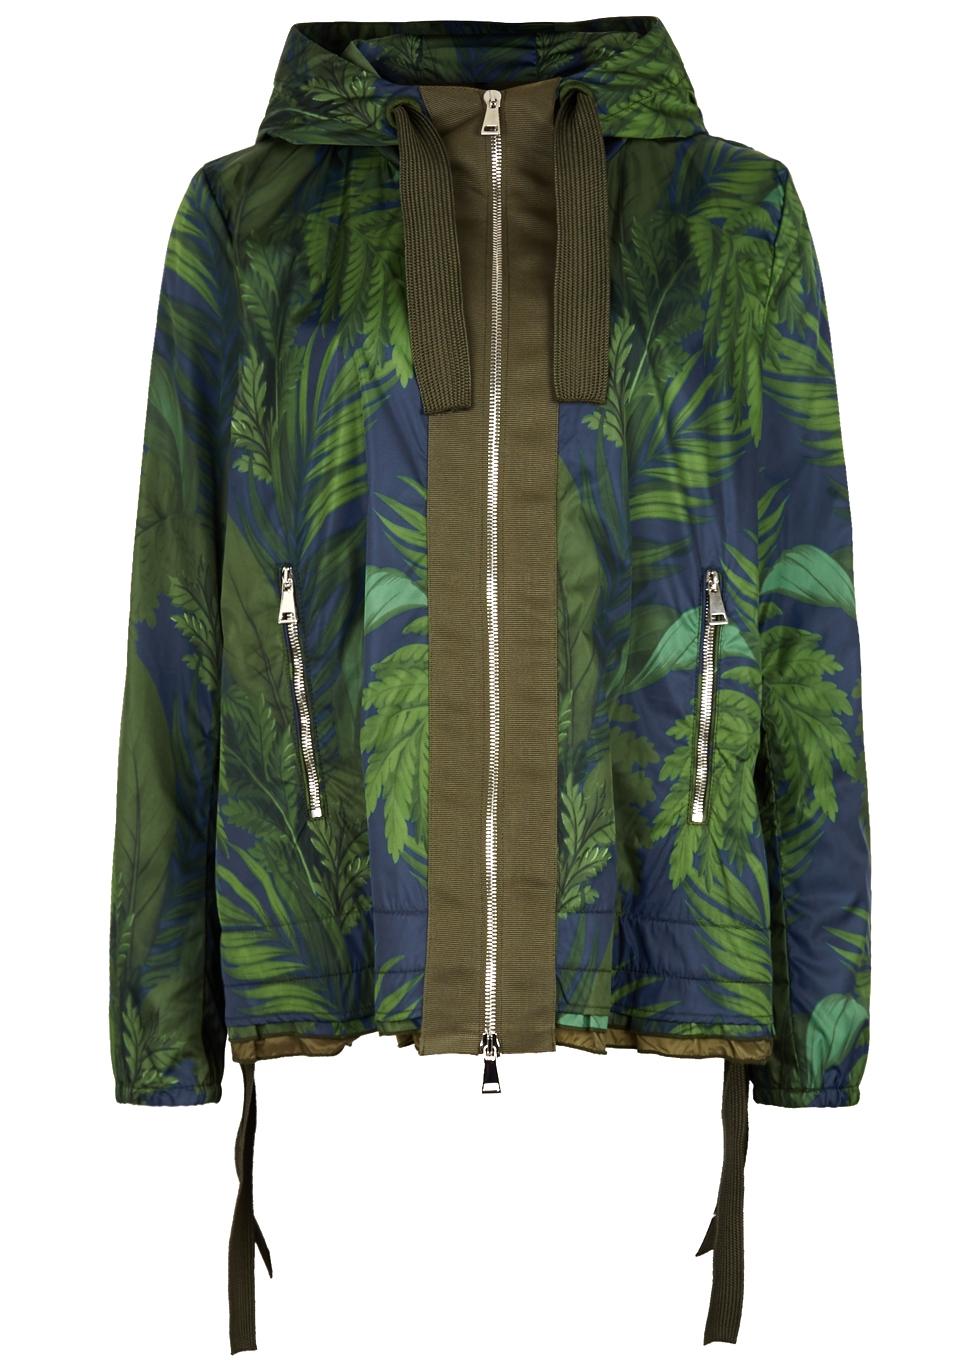 moncler coat harvey nichols